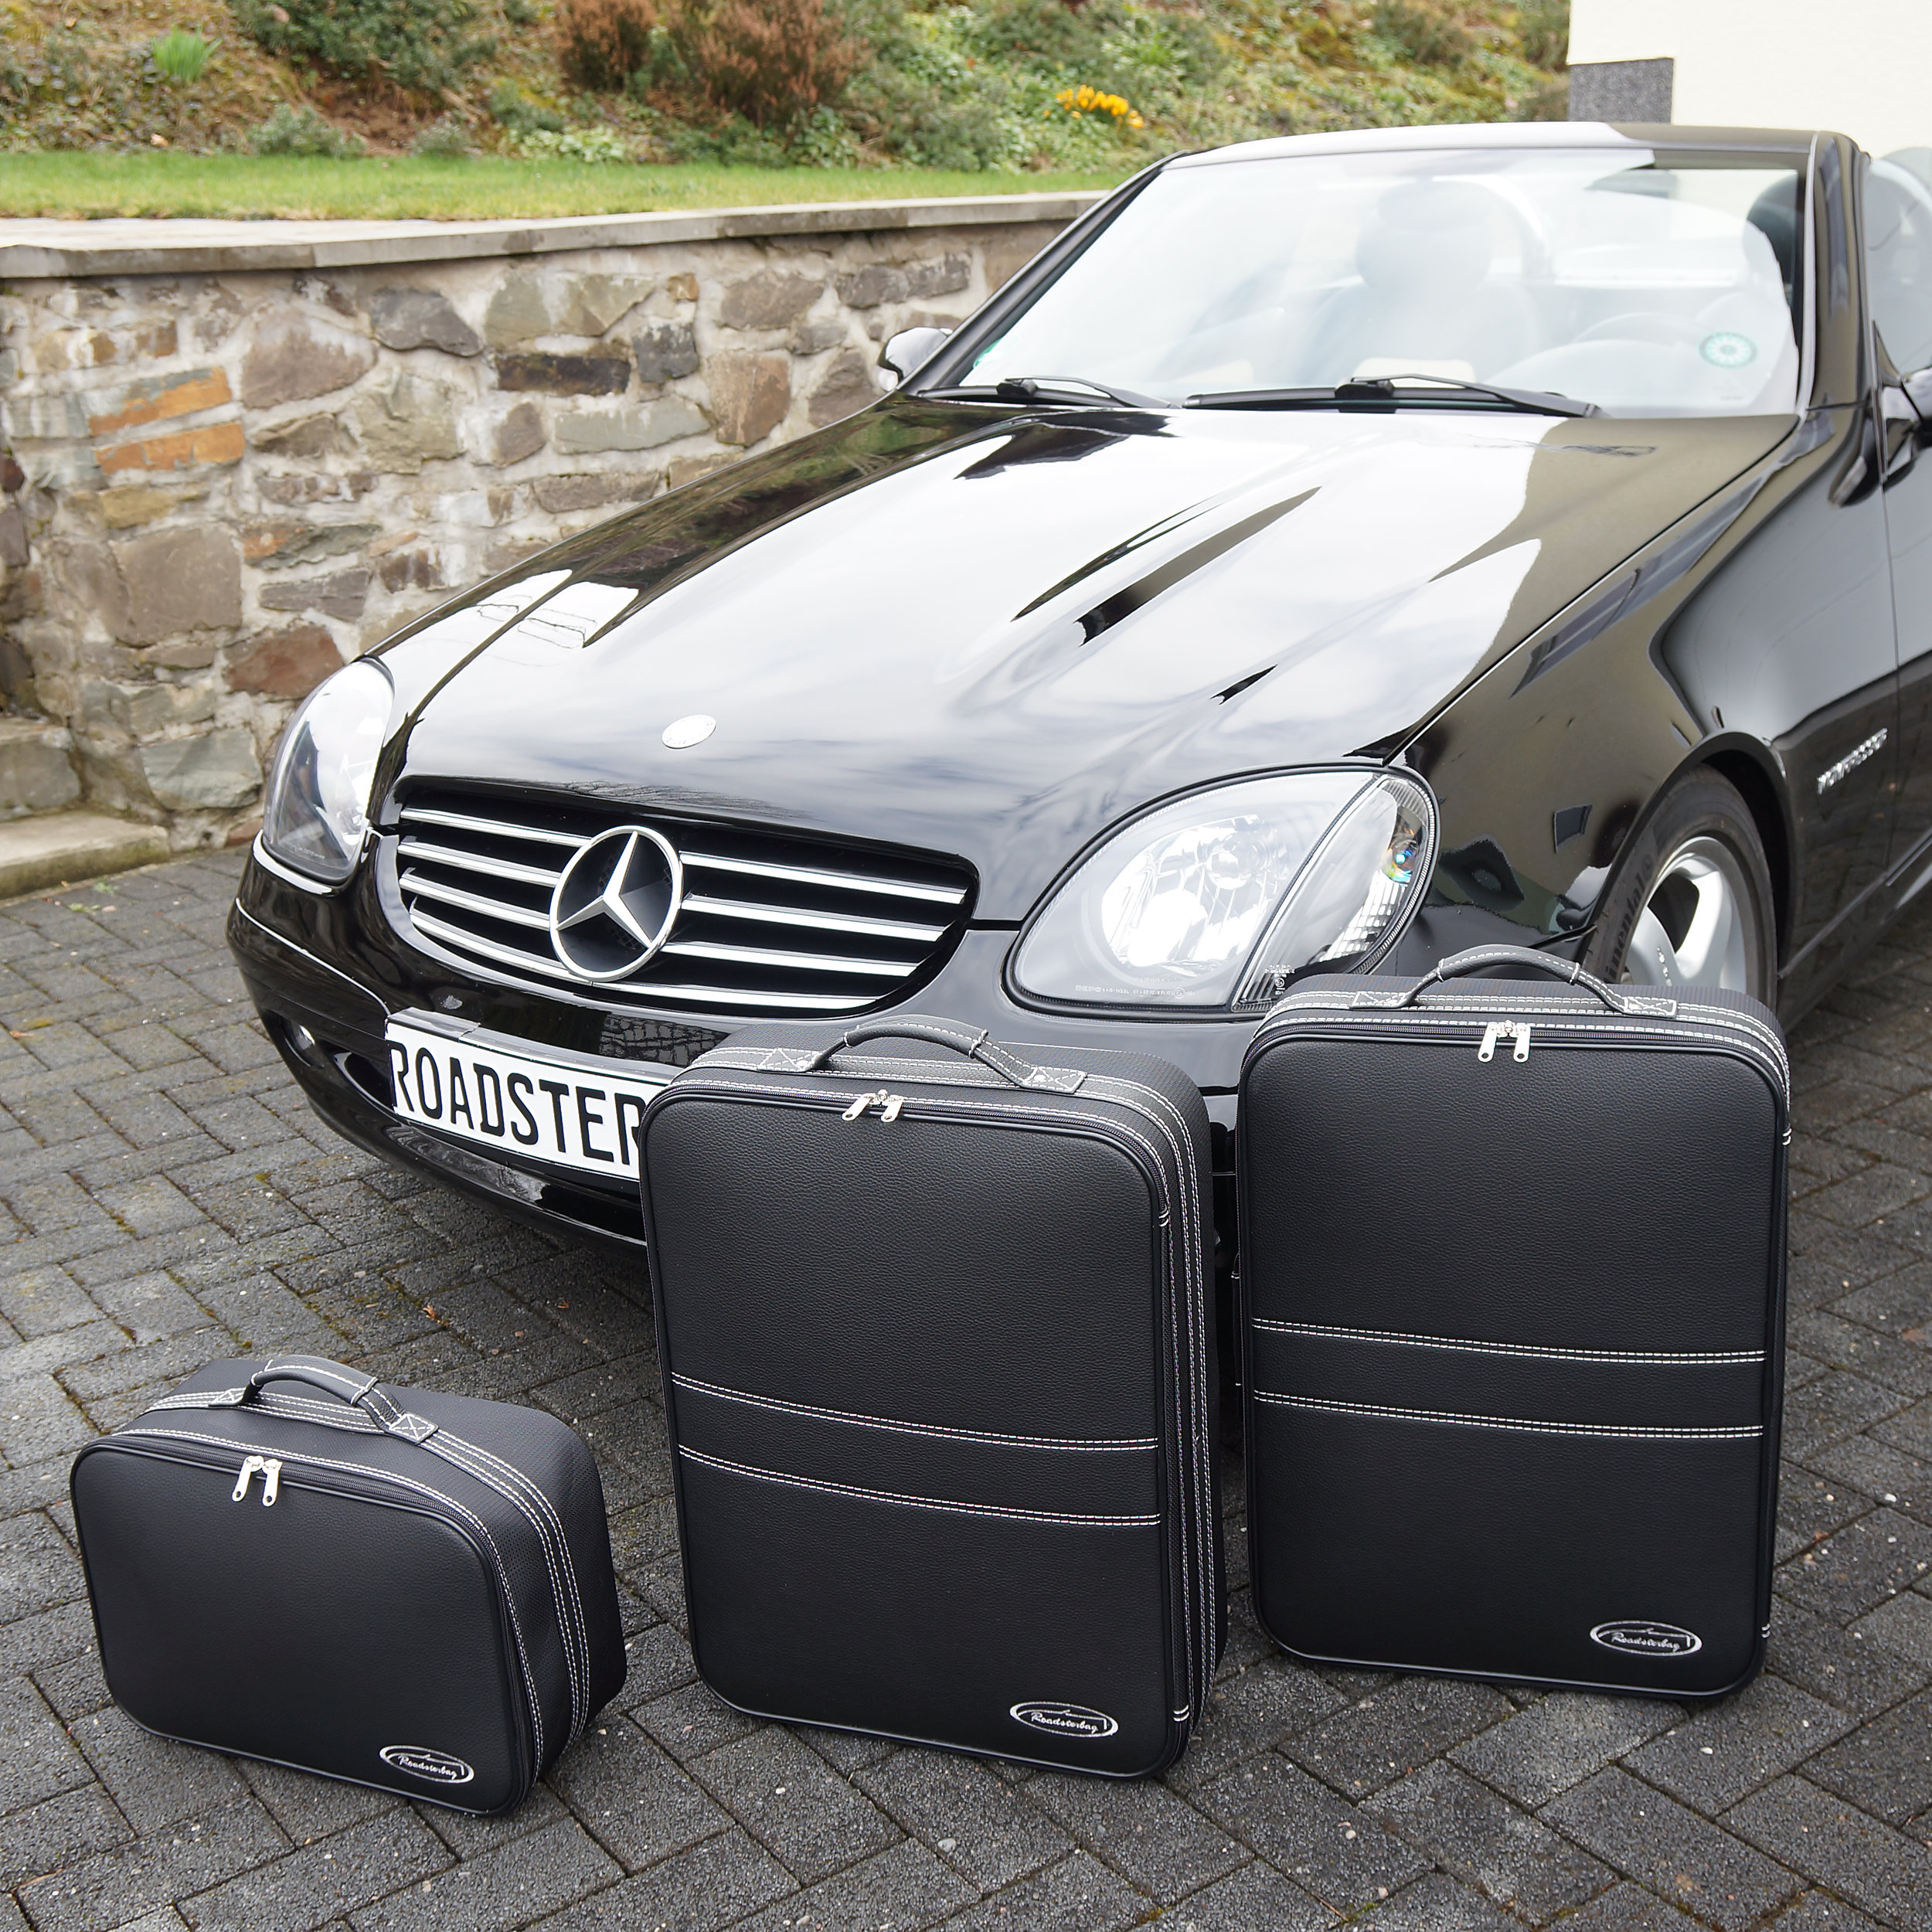 3-tlg. Kofferset Mercedes SLK (R170) 106 Liter